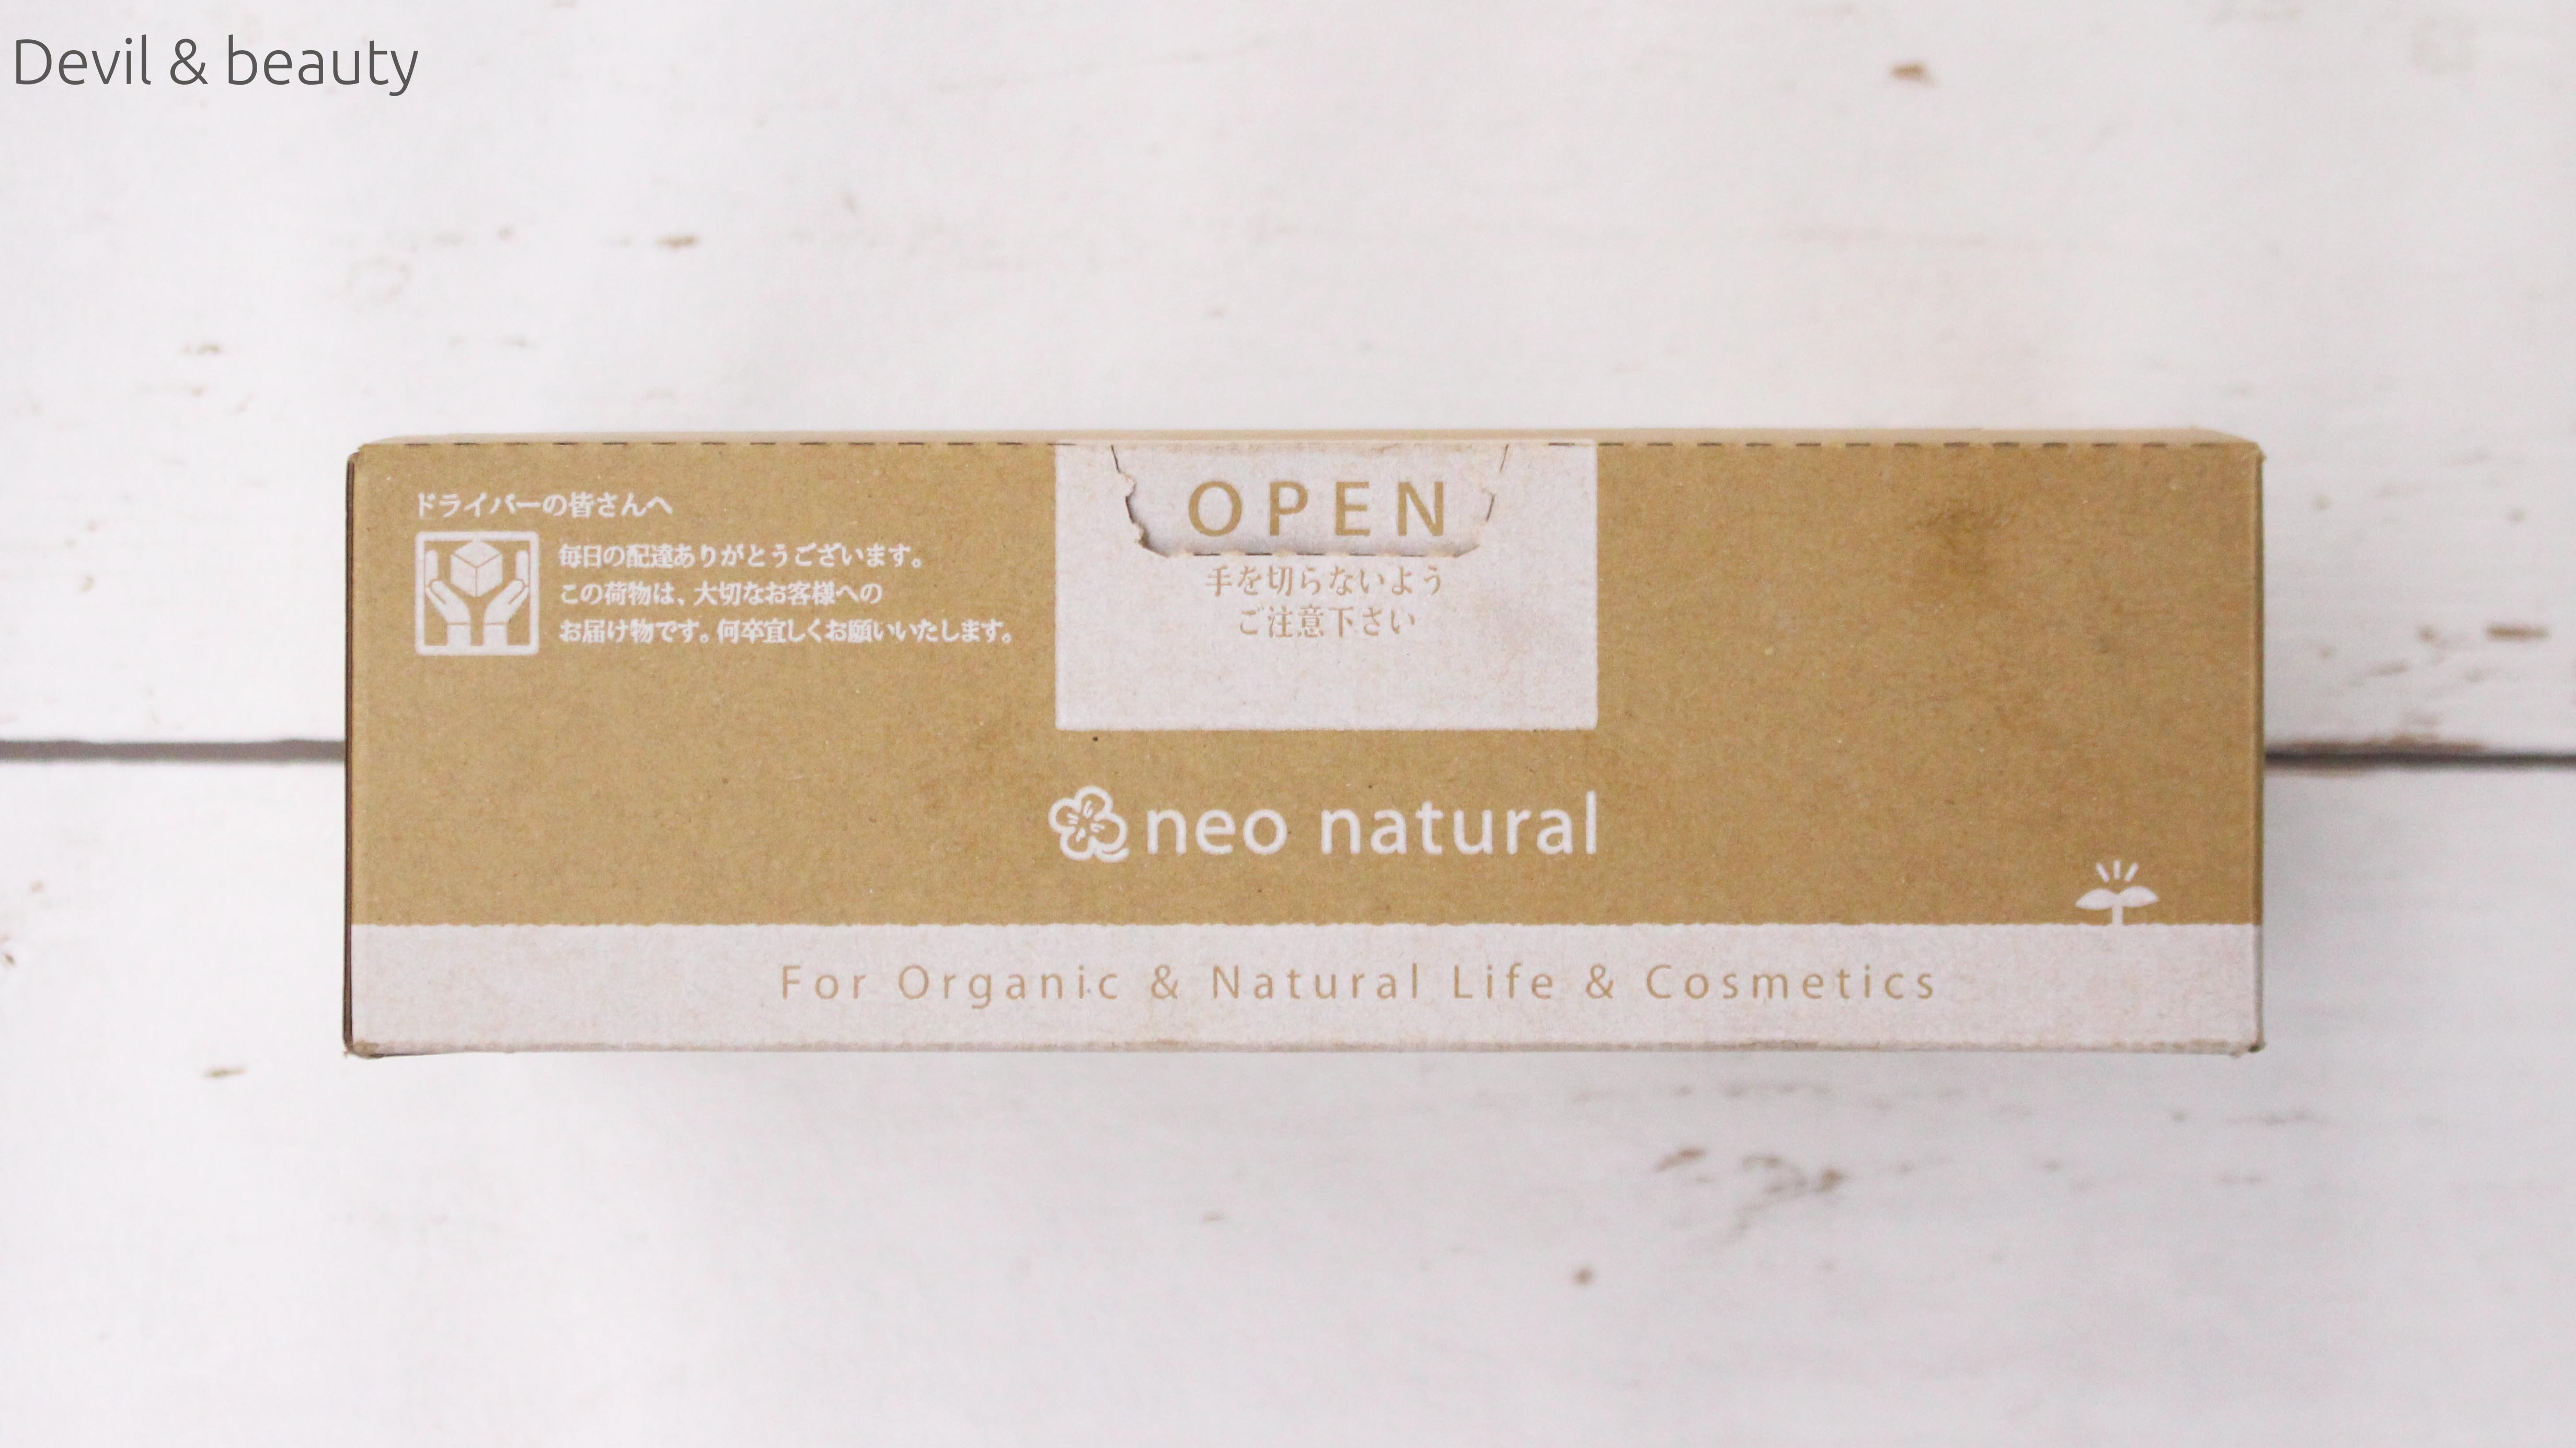 neo-natural-herbal-soap2 - image